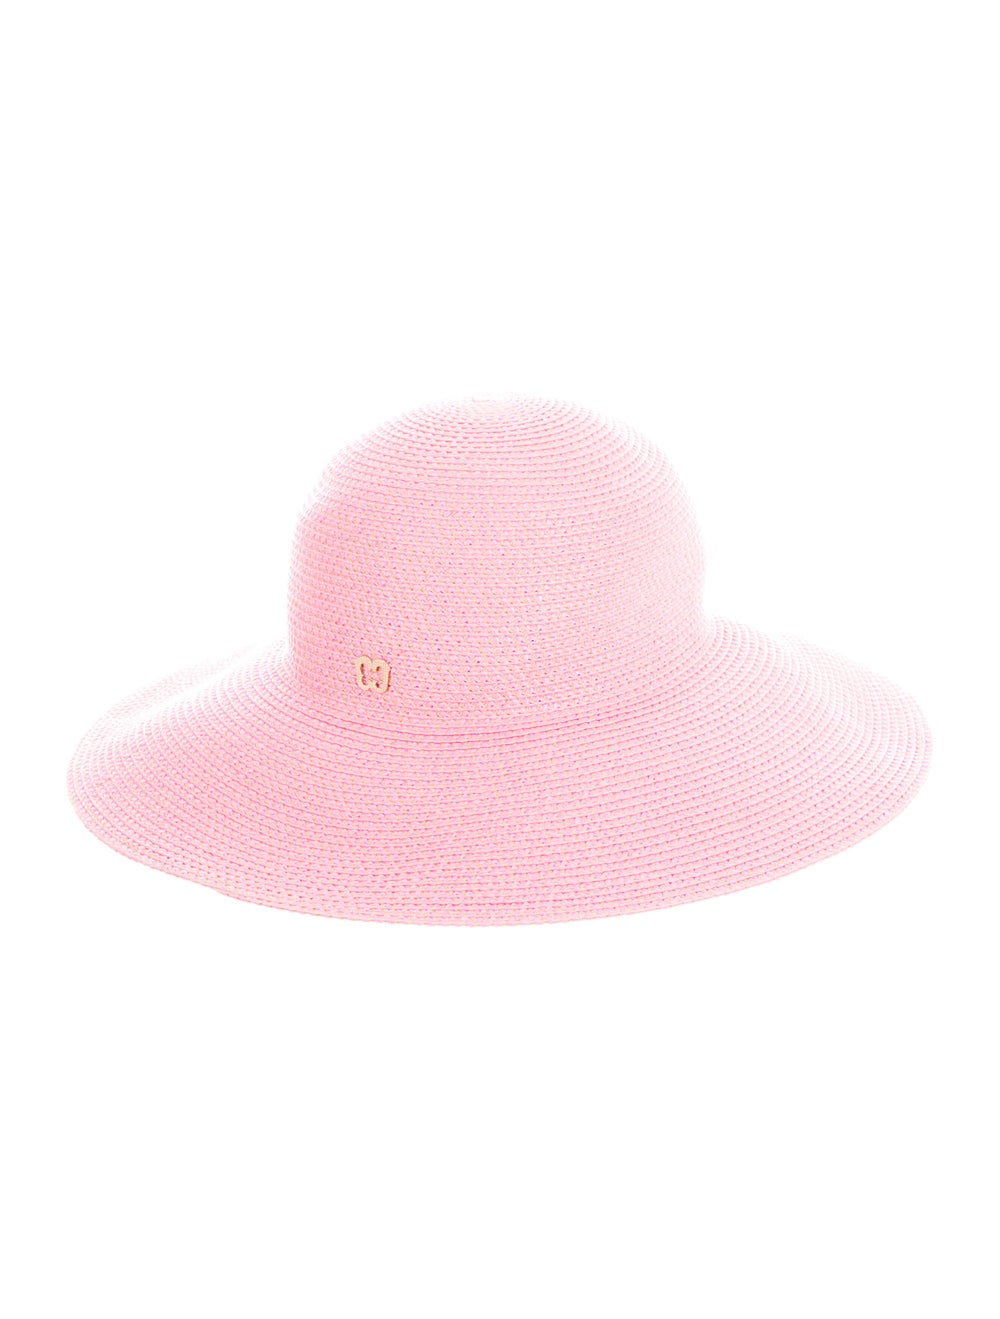 Eric Javits Straw Wide-Brim Hat Pink - image 2